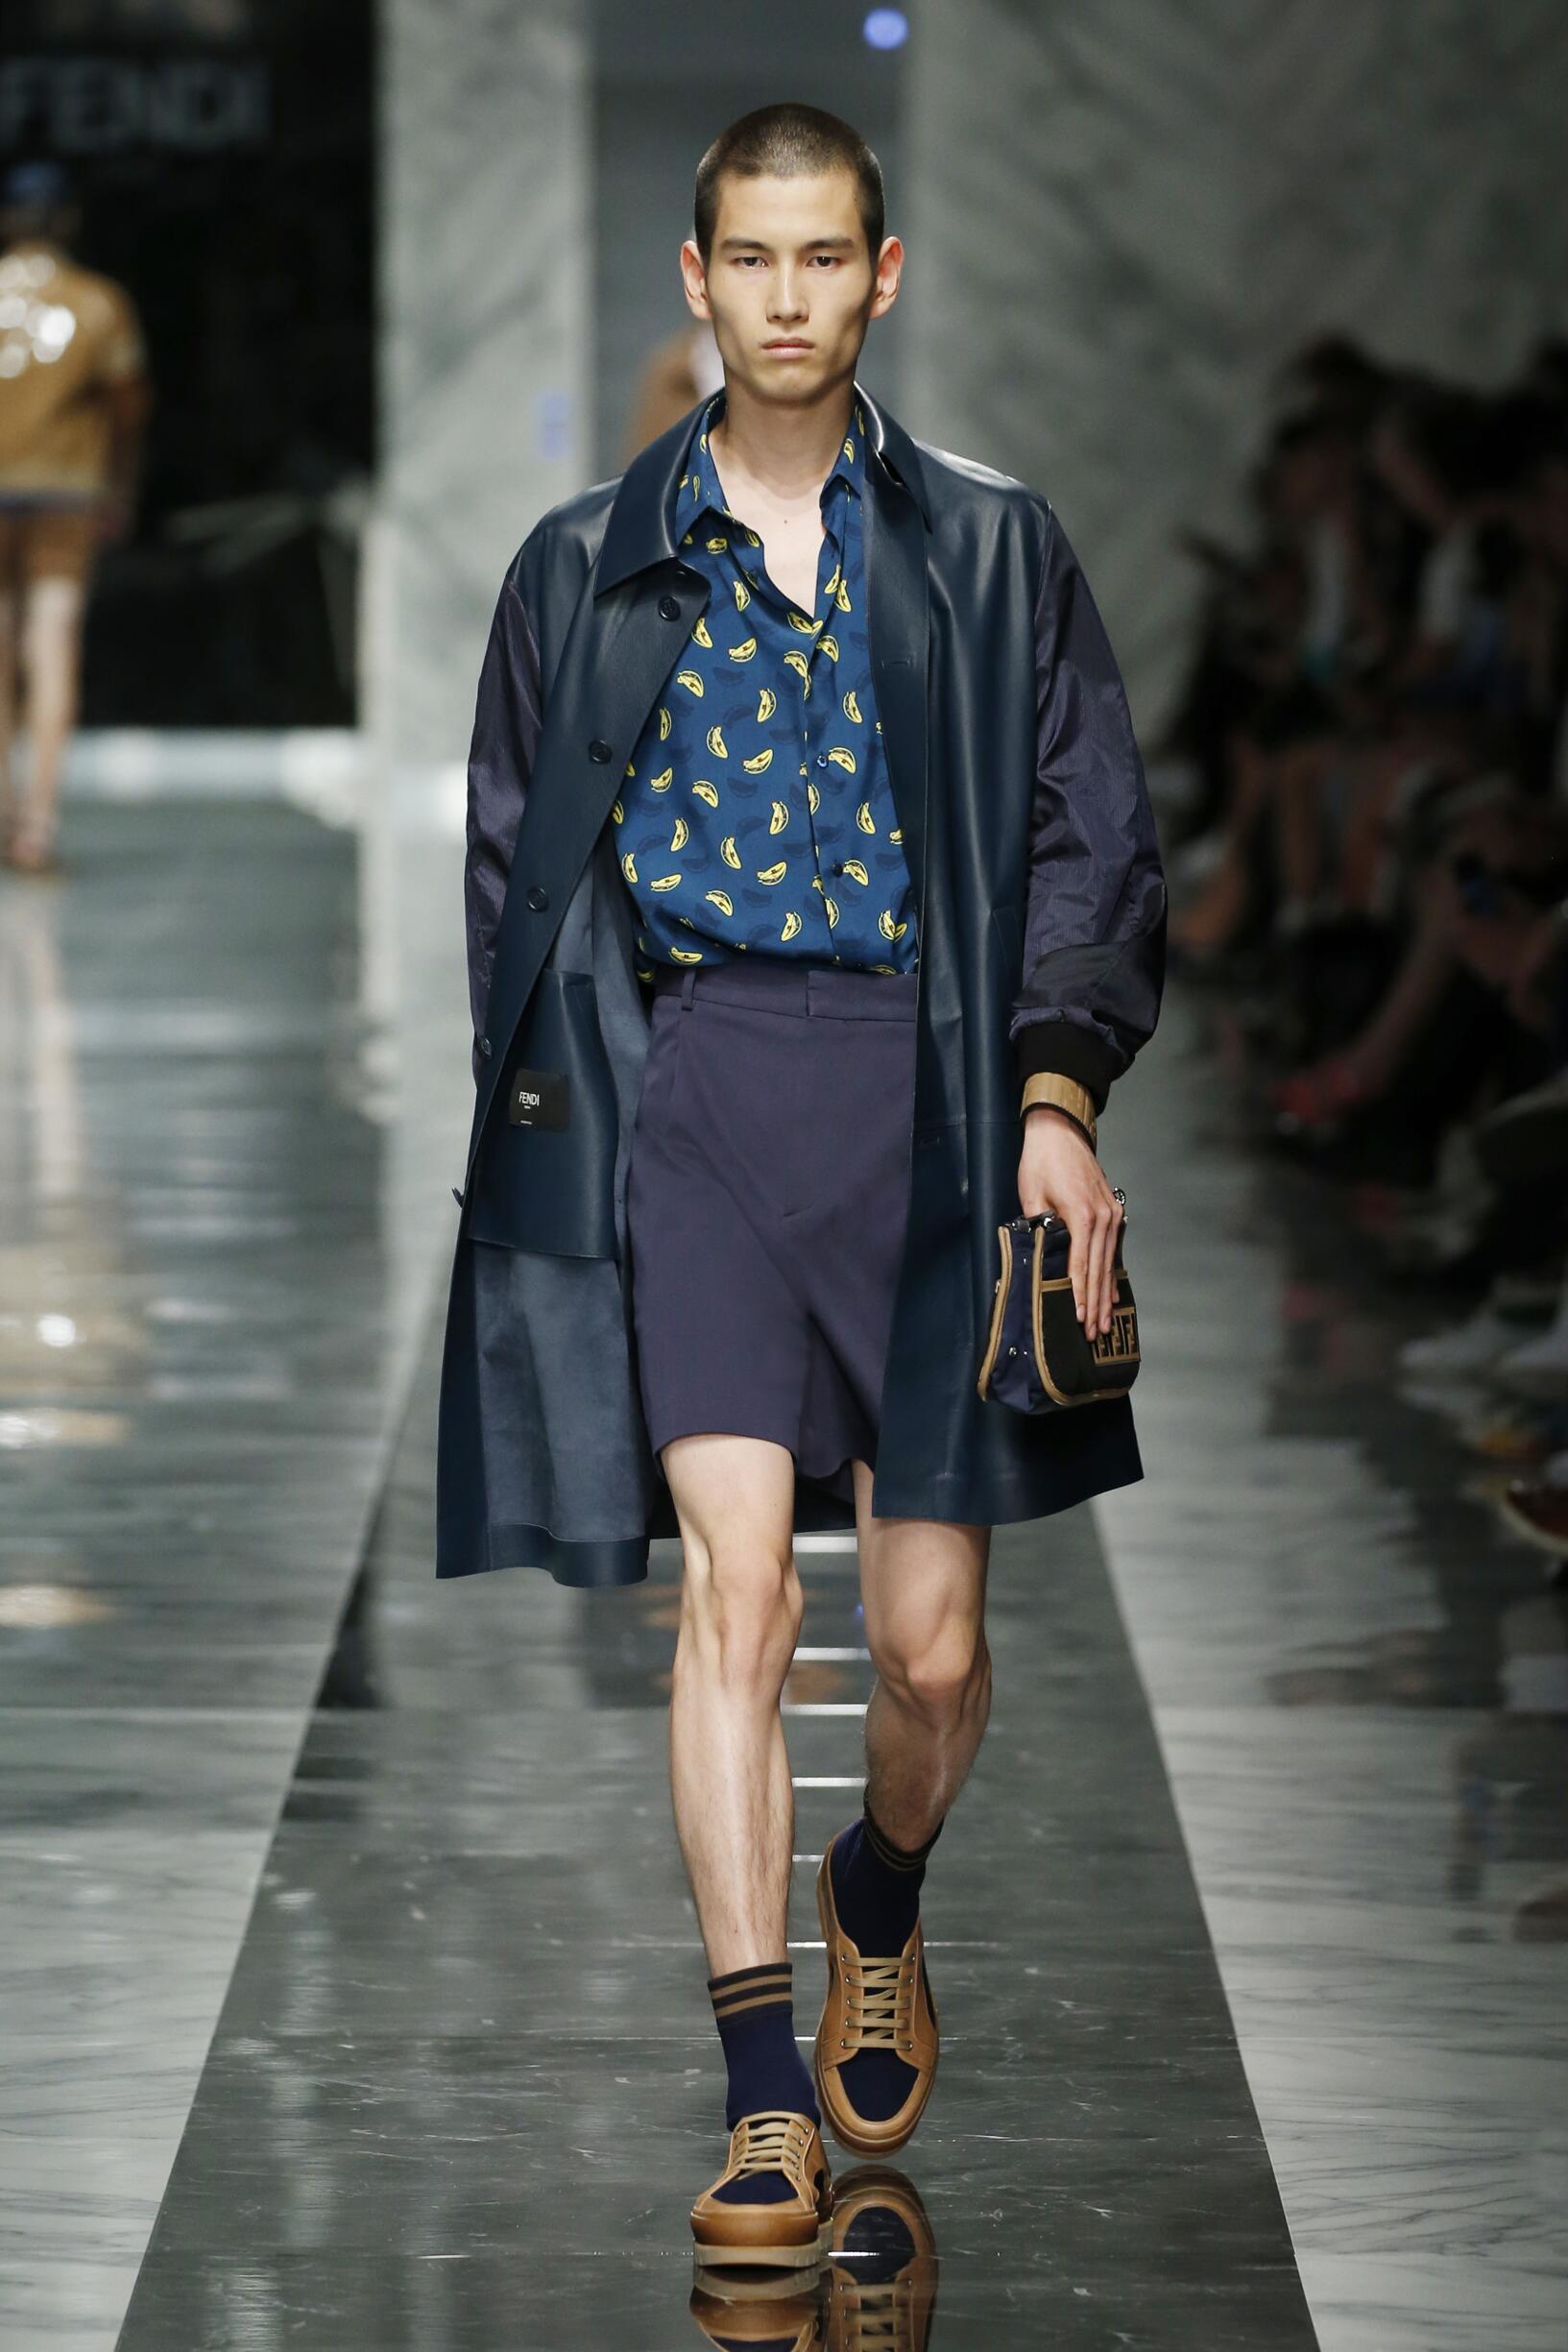 2018 Catwalk Fendi Man Fashion Show Summer